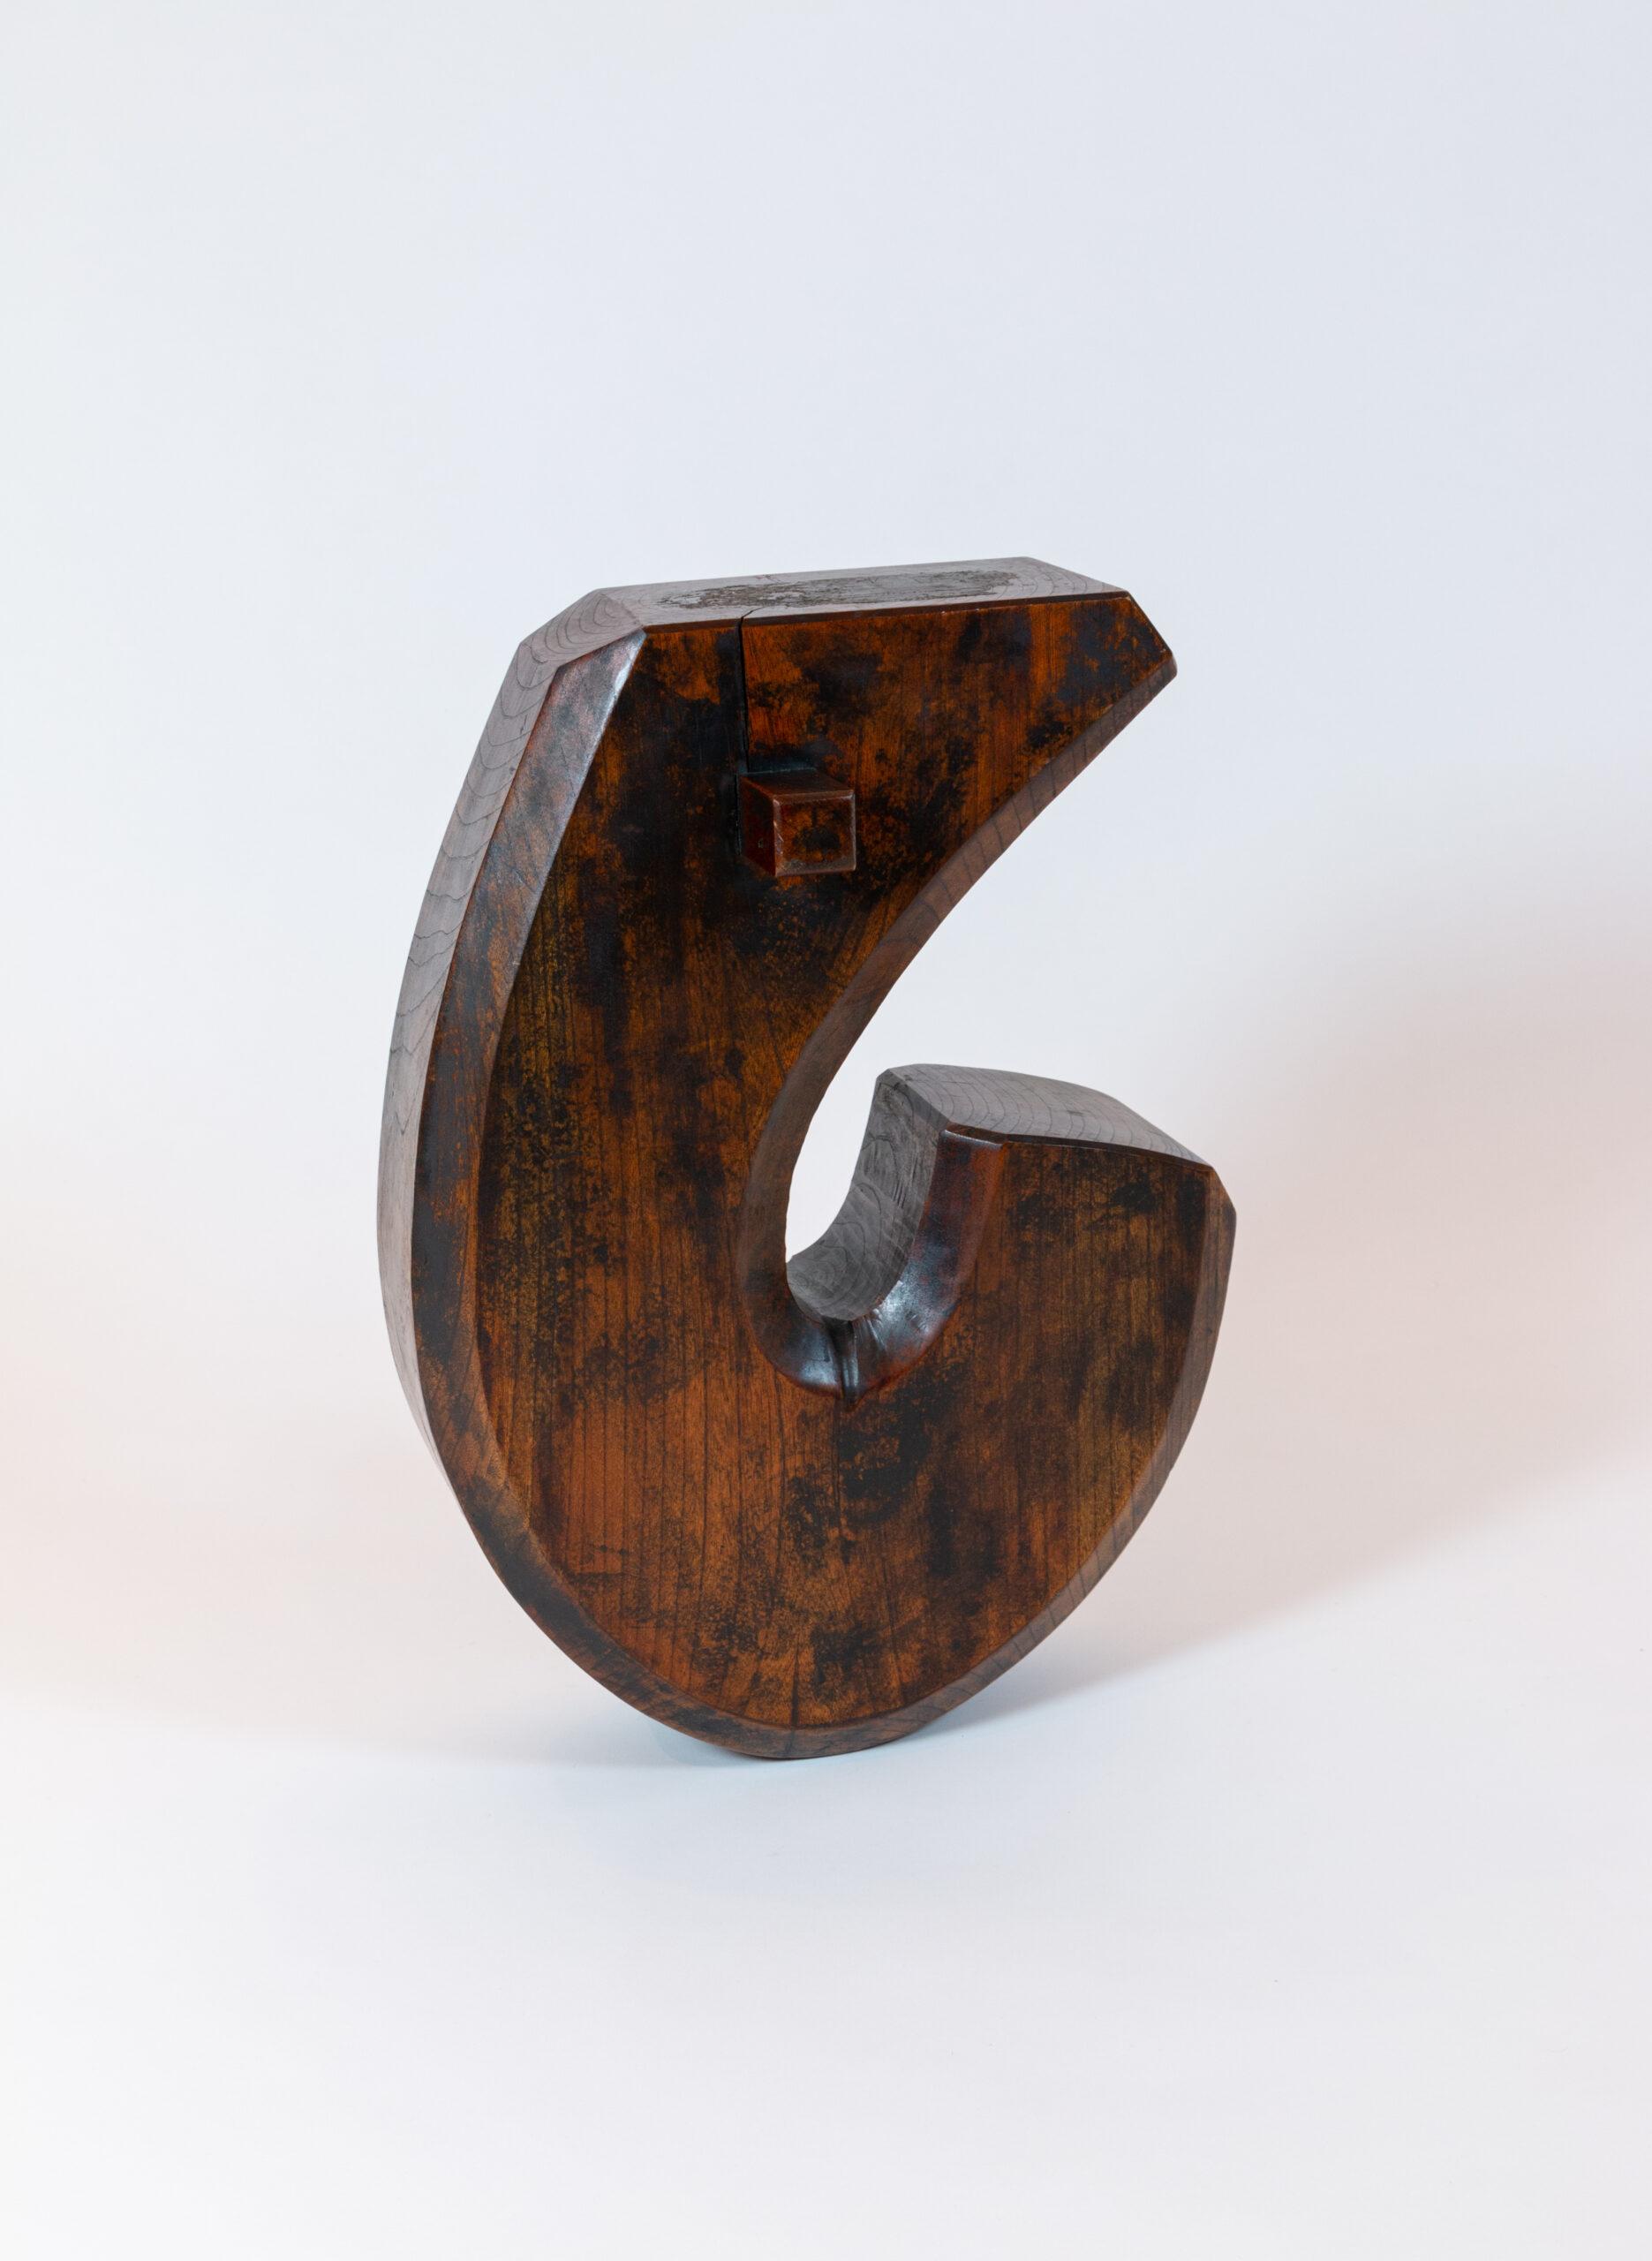 Antique Japanese Jizai Kagi (Hearth Hook)